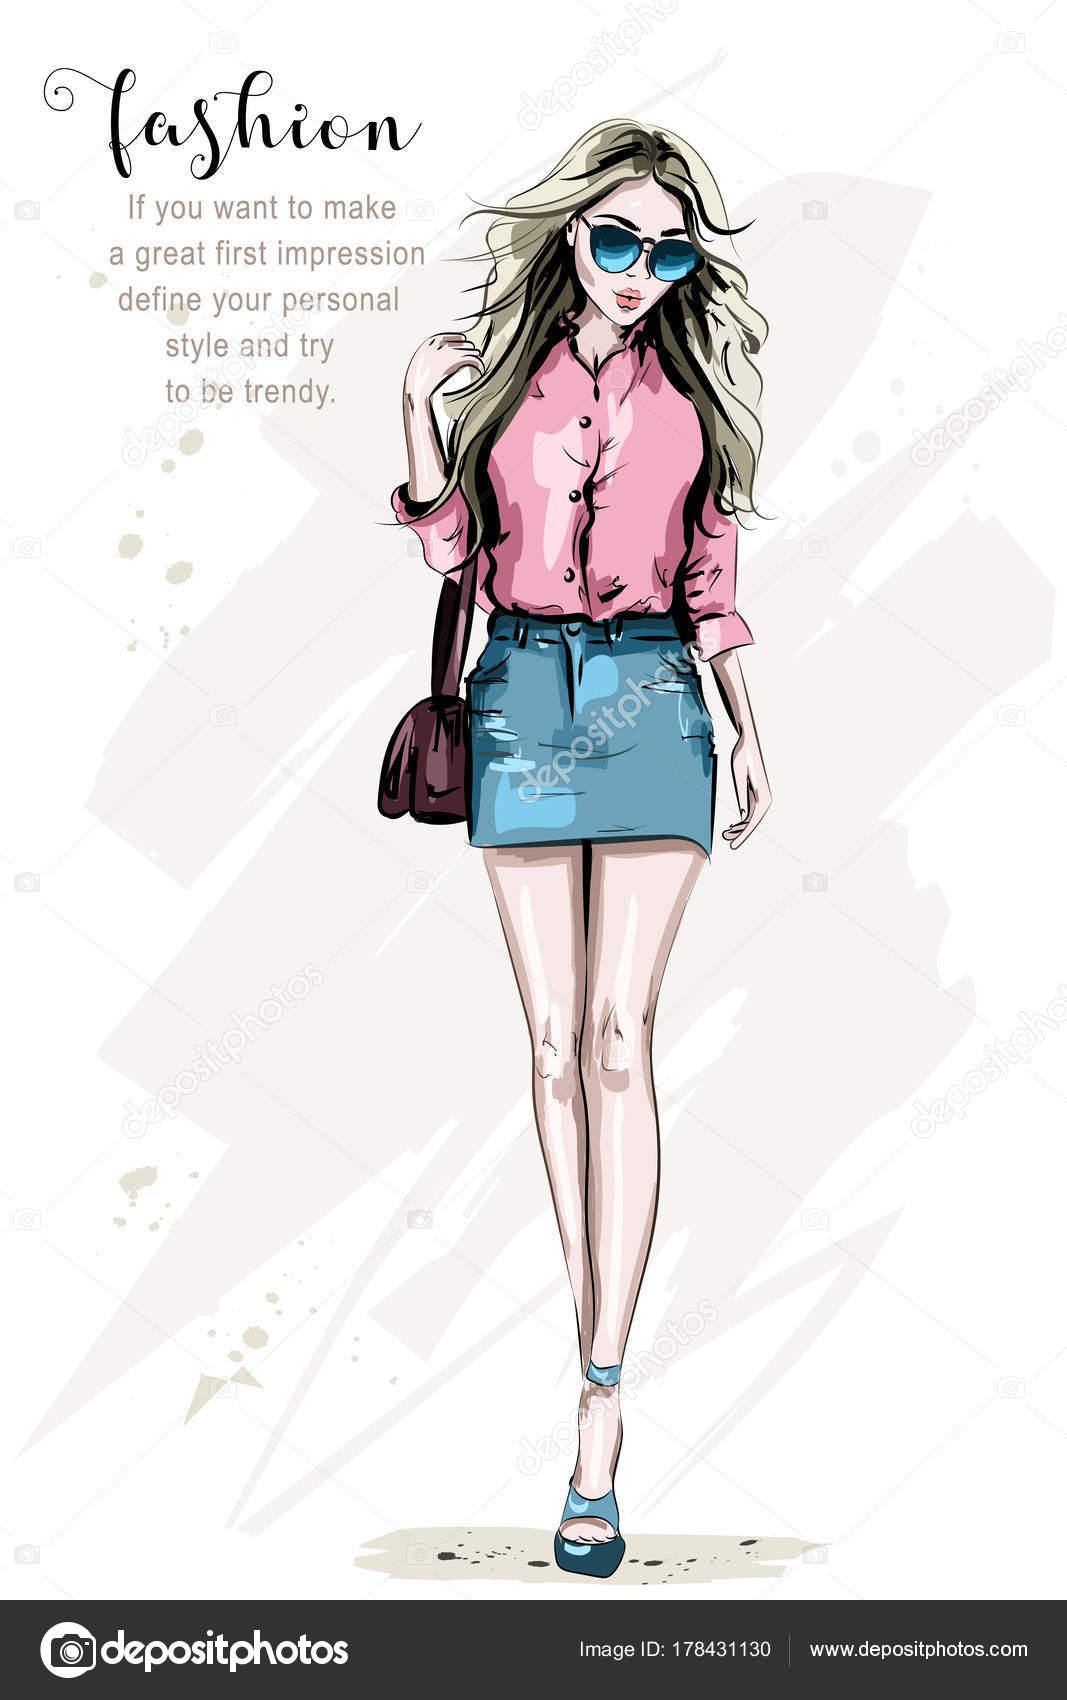 c3d235e46 Modelo Posando Manera Mano Dibujada Elegante Mujer Ropa Moda Hermosa ...